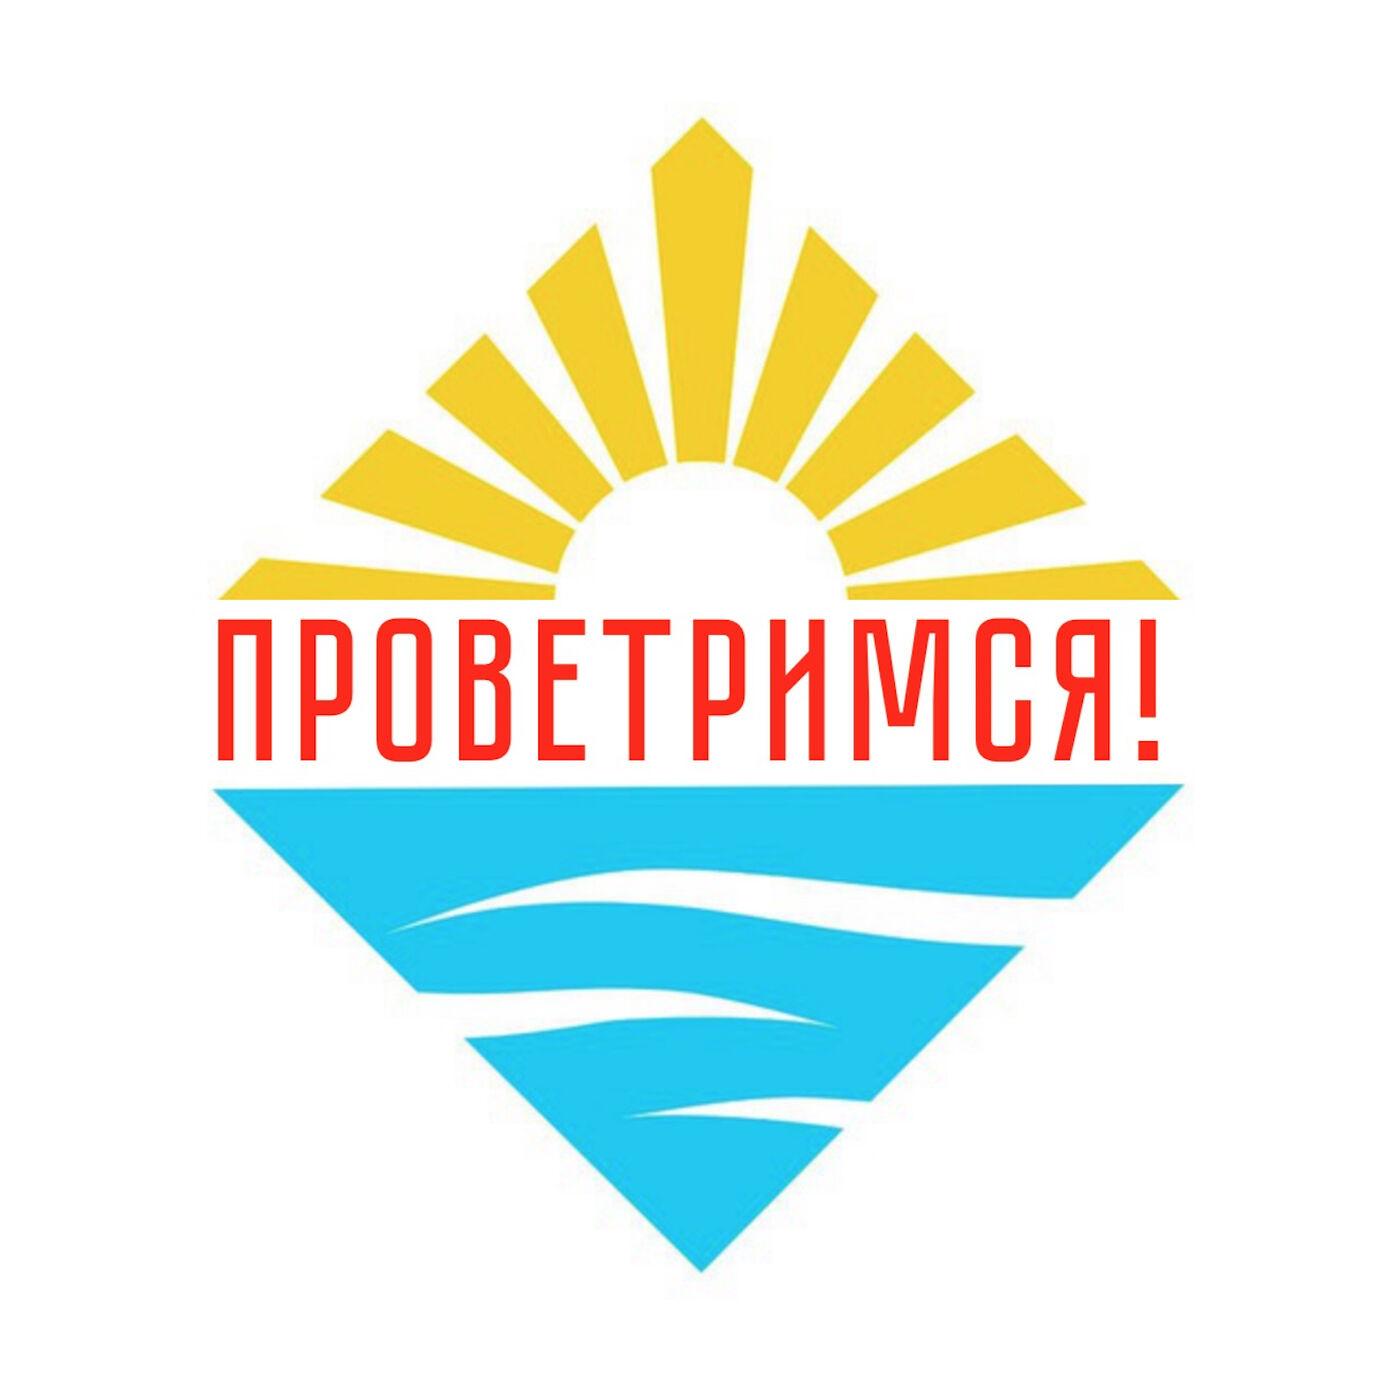 Иван Ямщиков Acя Казанцева live